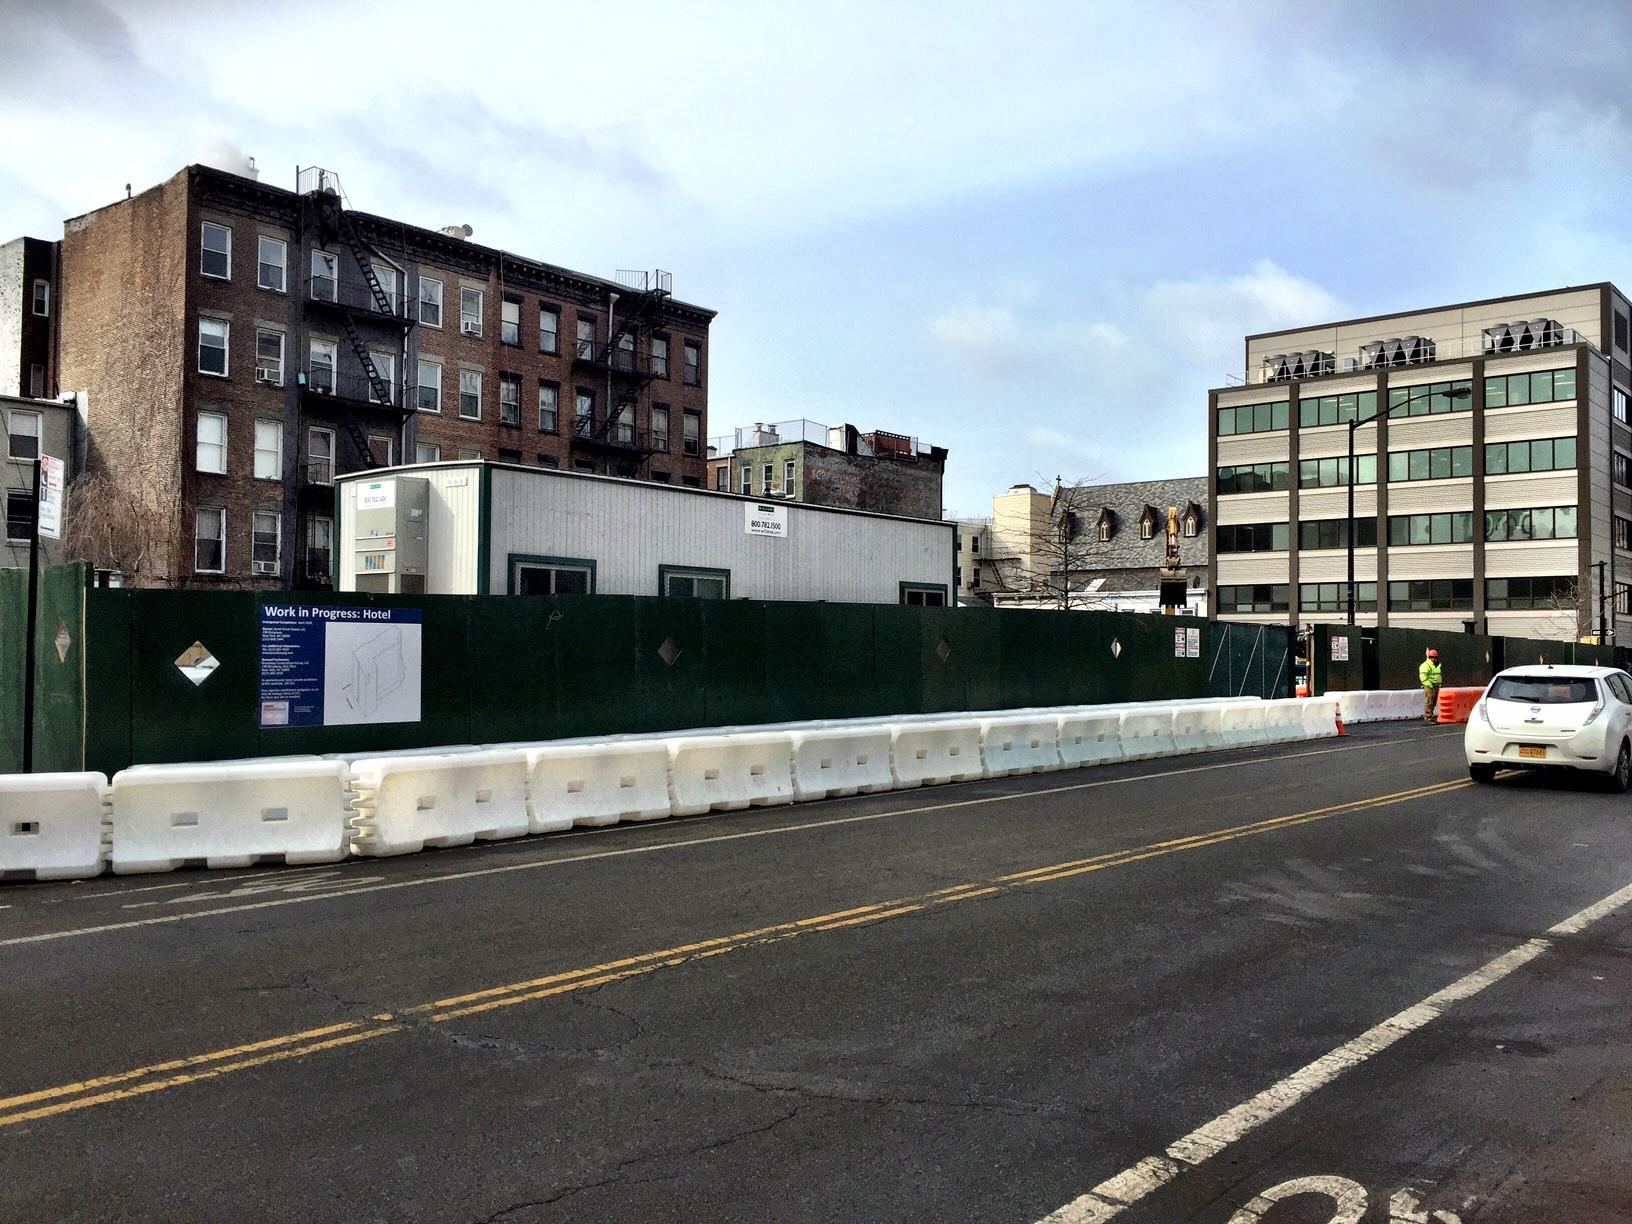 61 Bond Street construction site as viewed from Schermerhorn Street. Photo by Tectonic.